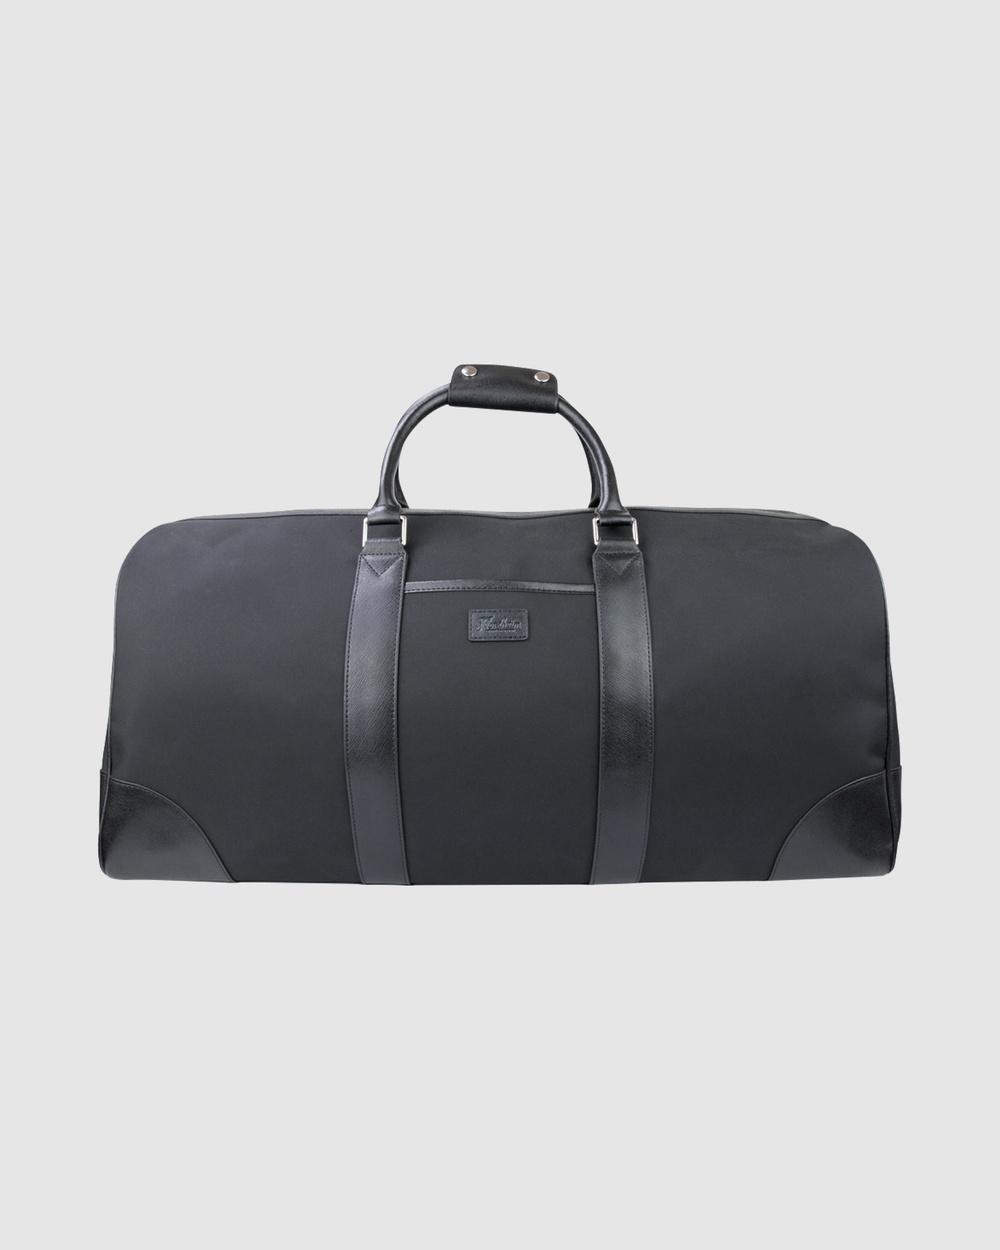 Florsheim Foxwood Overnight Bag Bags Black